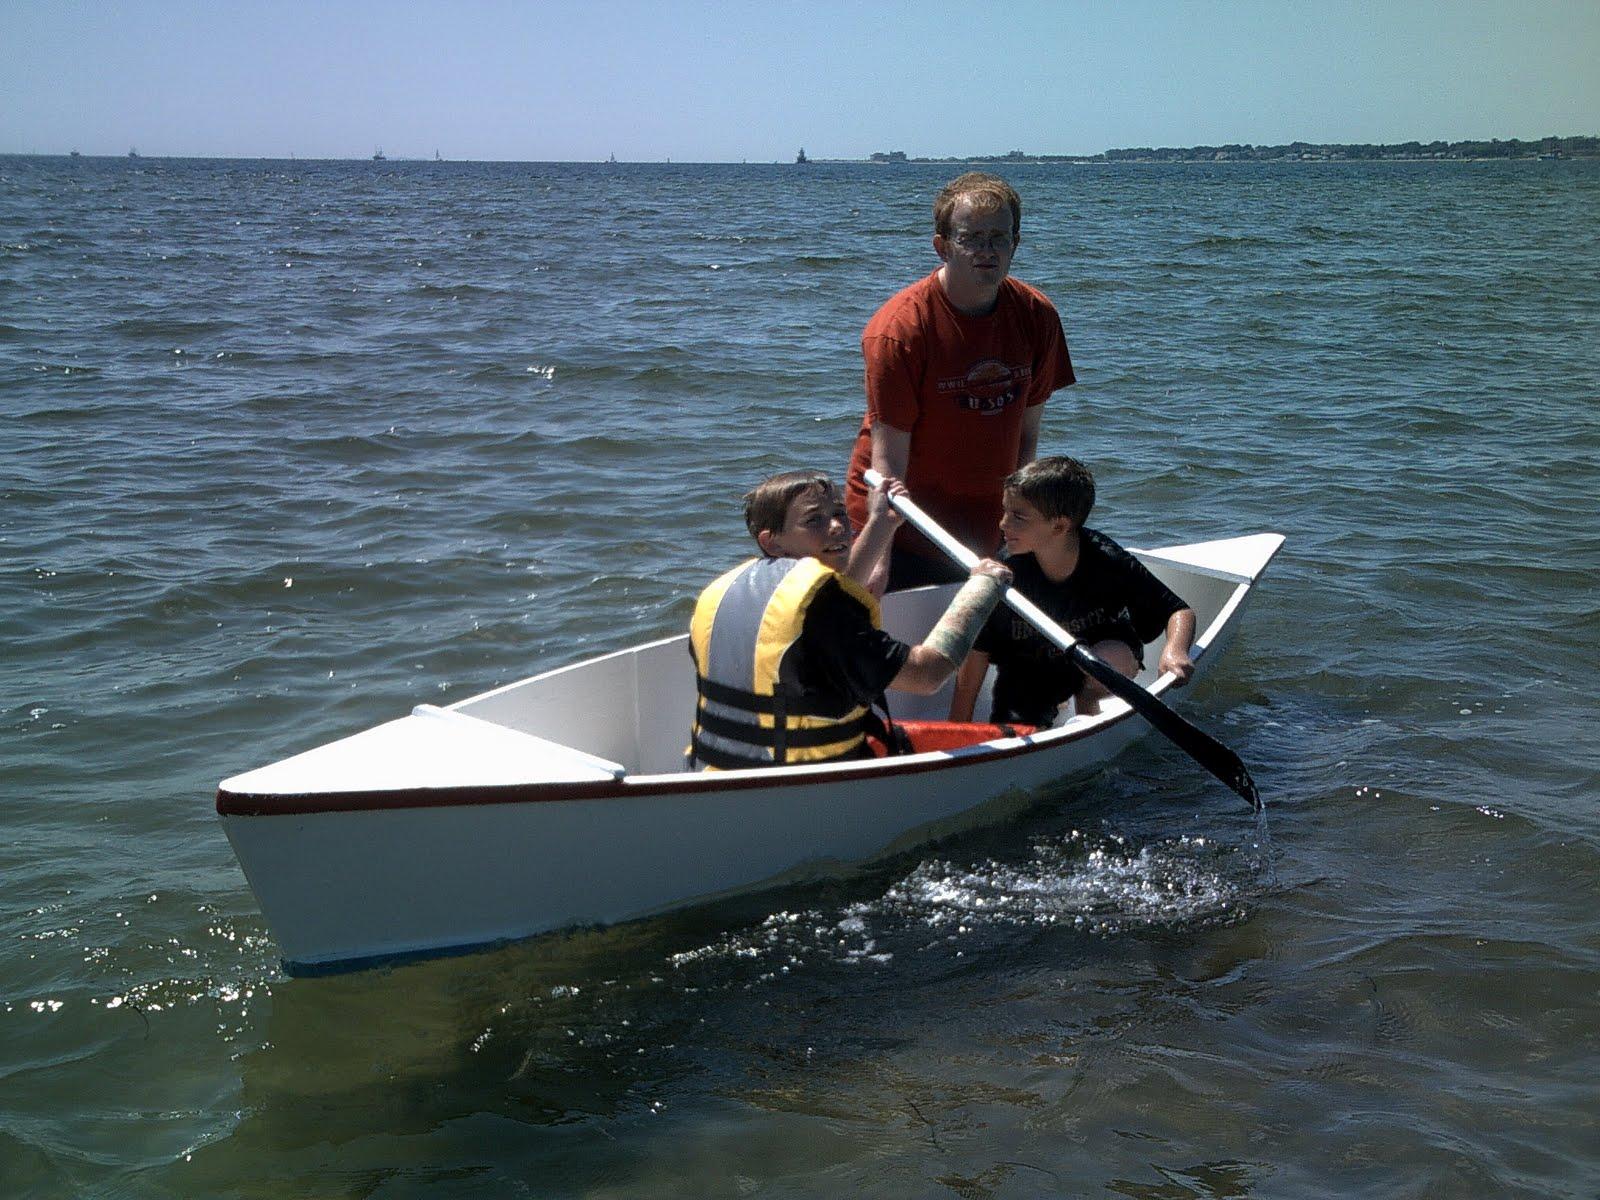 Michals-Brown Adventures: Building a Chuckanut 12 skin-on-frame kayak